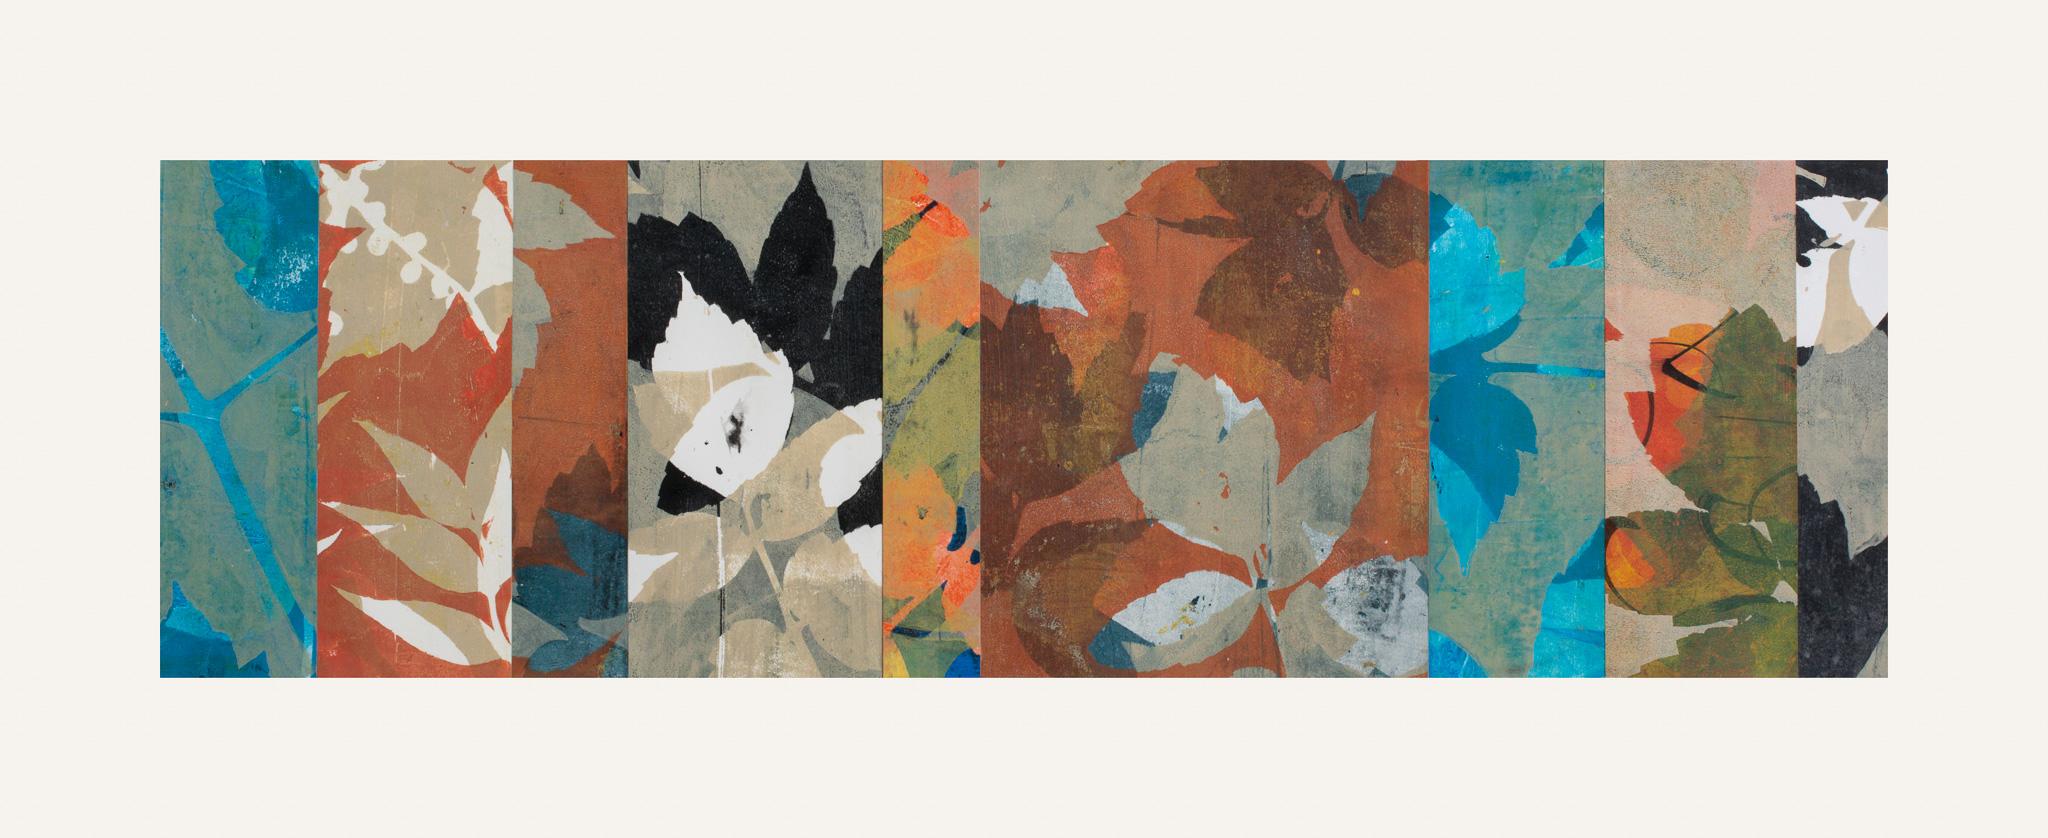 "Autumn Haze 1, 11"" x 30,"" Monoprint collage"